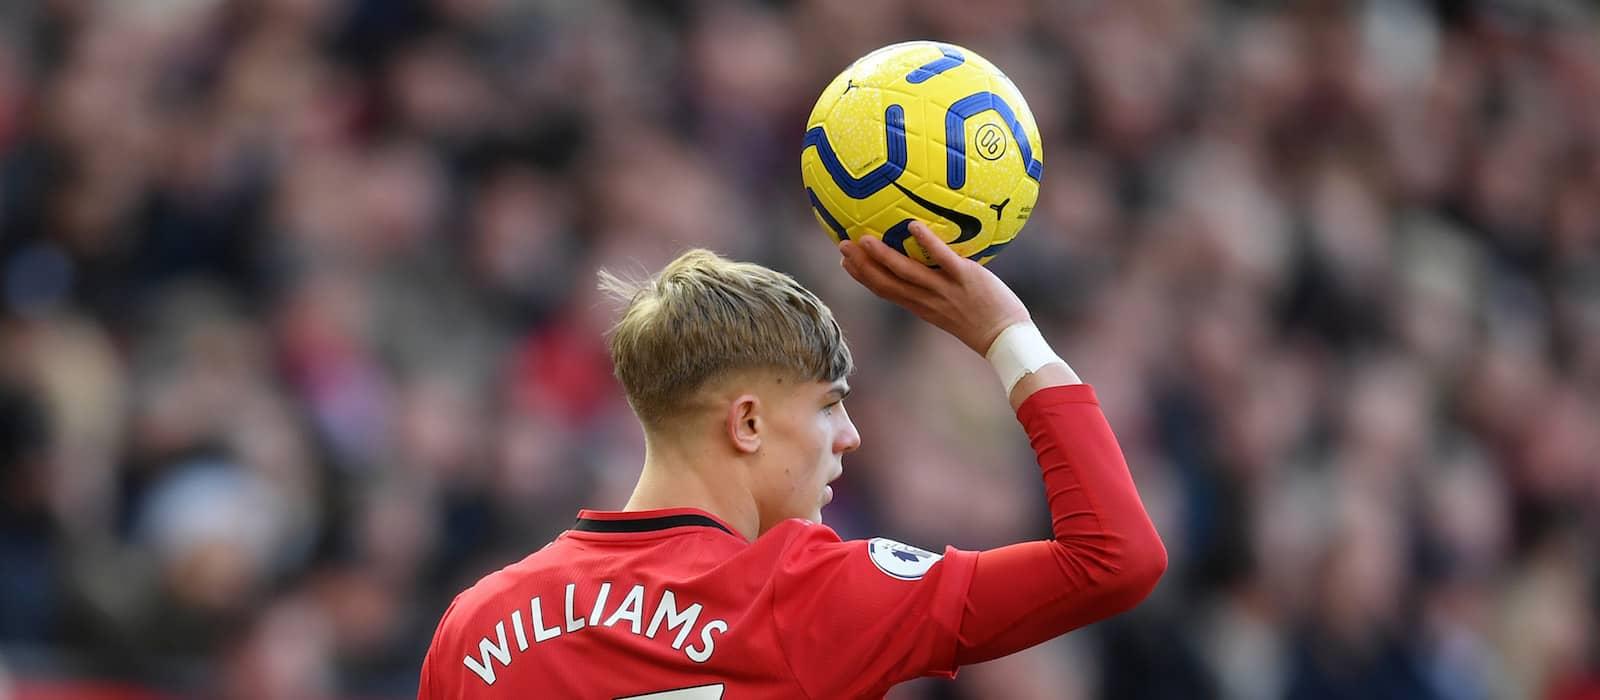 Brandon Williams impresses despite Manchester United dropping points vs Sheffield United